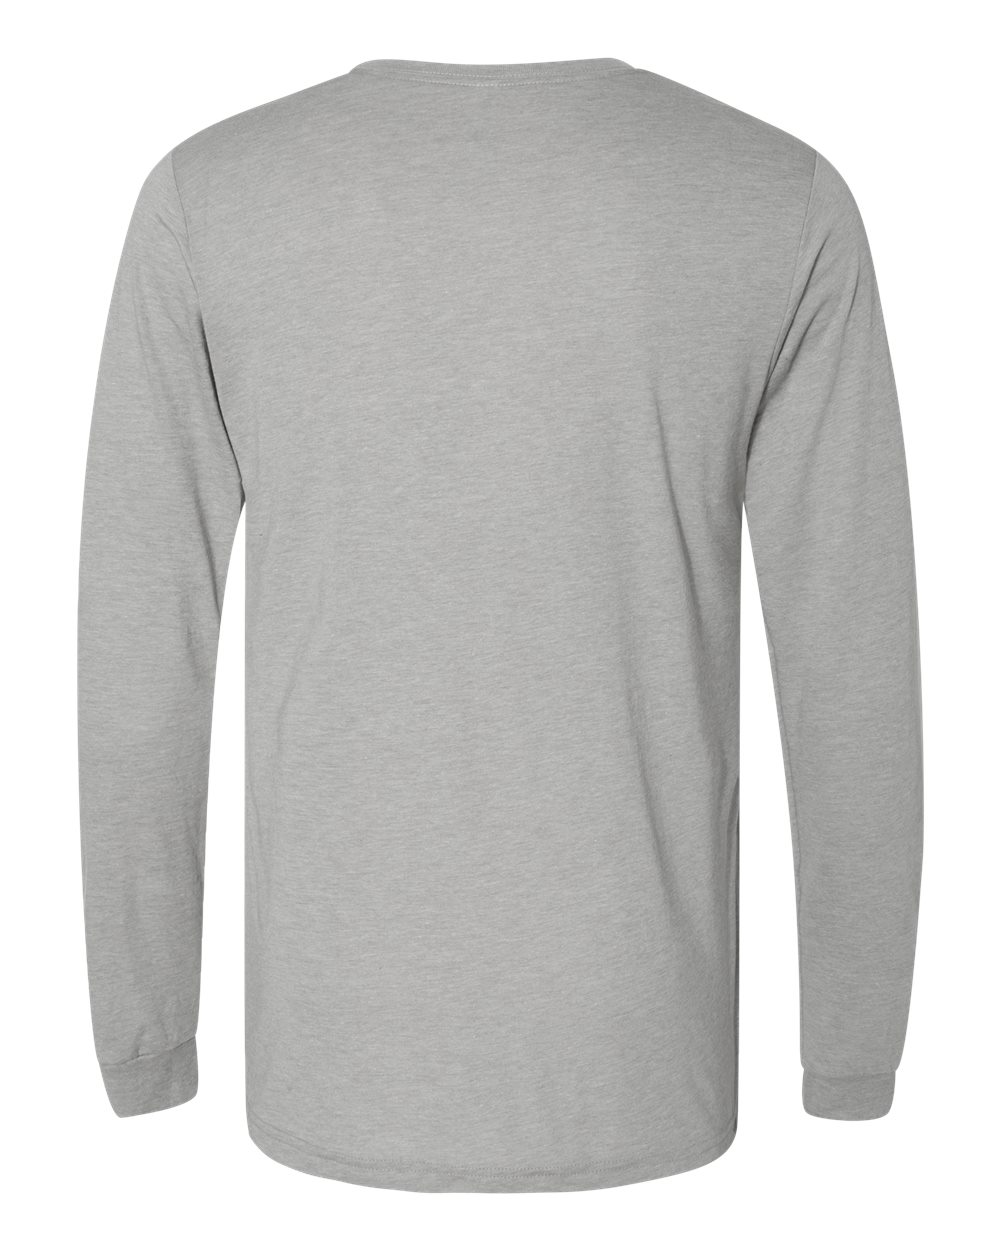 Bella-Canvas-Mens-Blank-Top-Long-Sleeve-Jersey-Tee-T-Shirt-3501-up-to-3XL thumbnail 13